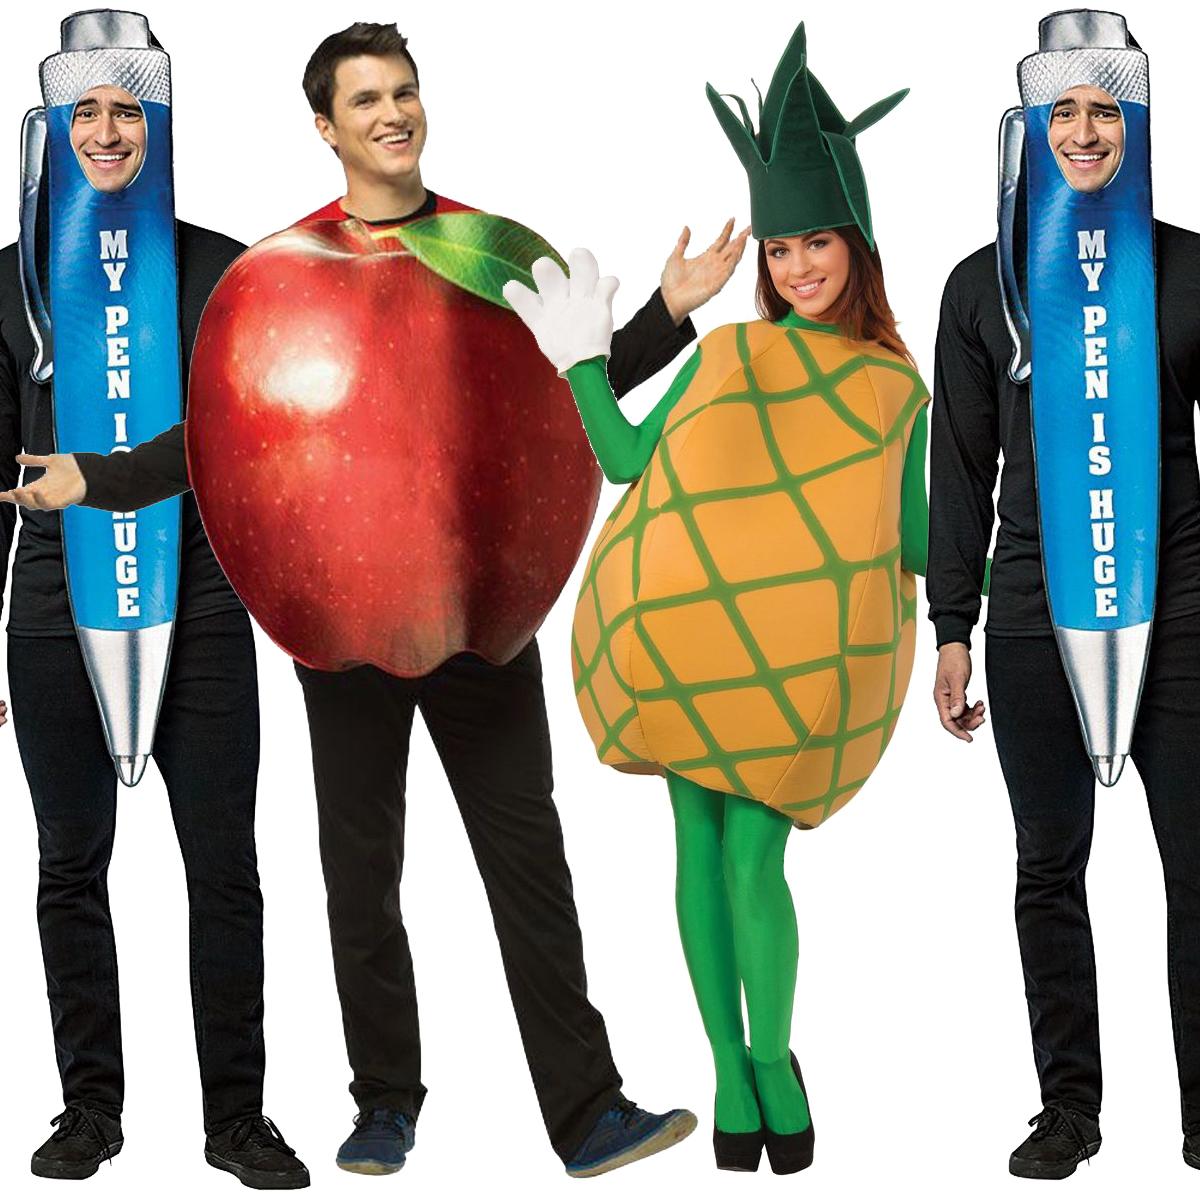 PPAP 衣装 ペンパイナッポーアッポーペン コスチューム おもしろコスプレ 4点 セット ハロウィン 忘年会 宴会 グループ グッズ ペン りんご パイナップル